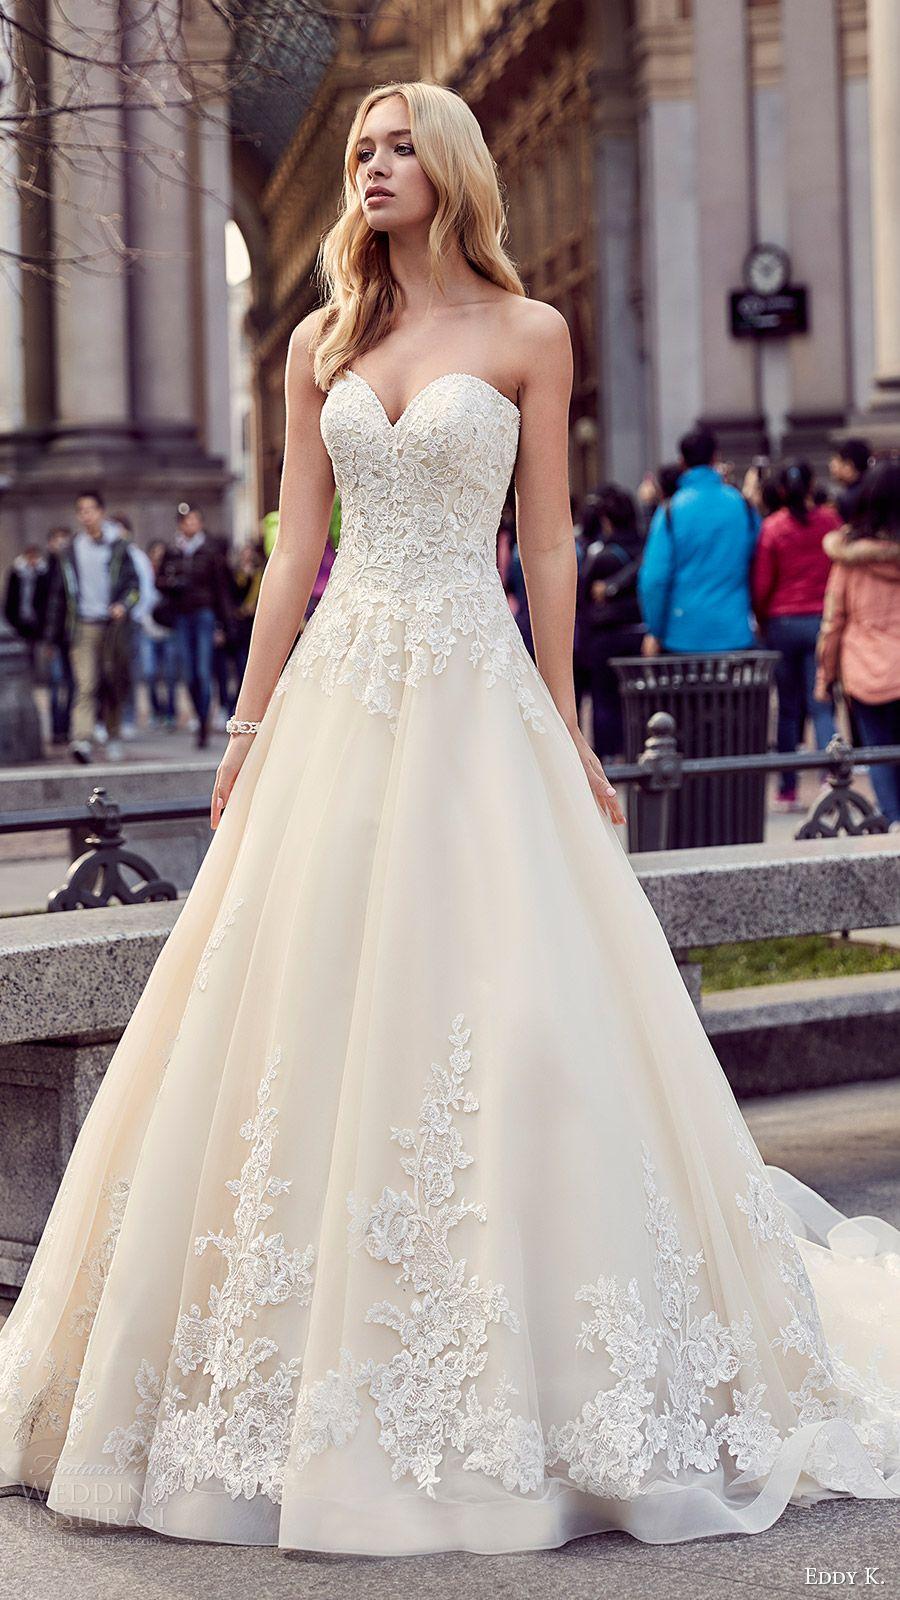 Eddy K 2017 Wedding Dresses Milano Bridal Collection Svatba